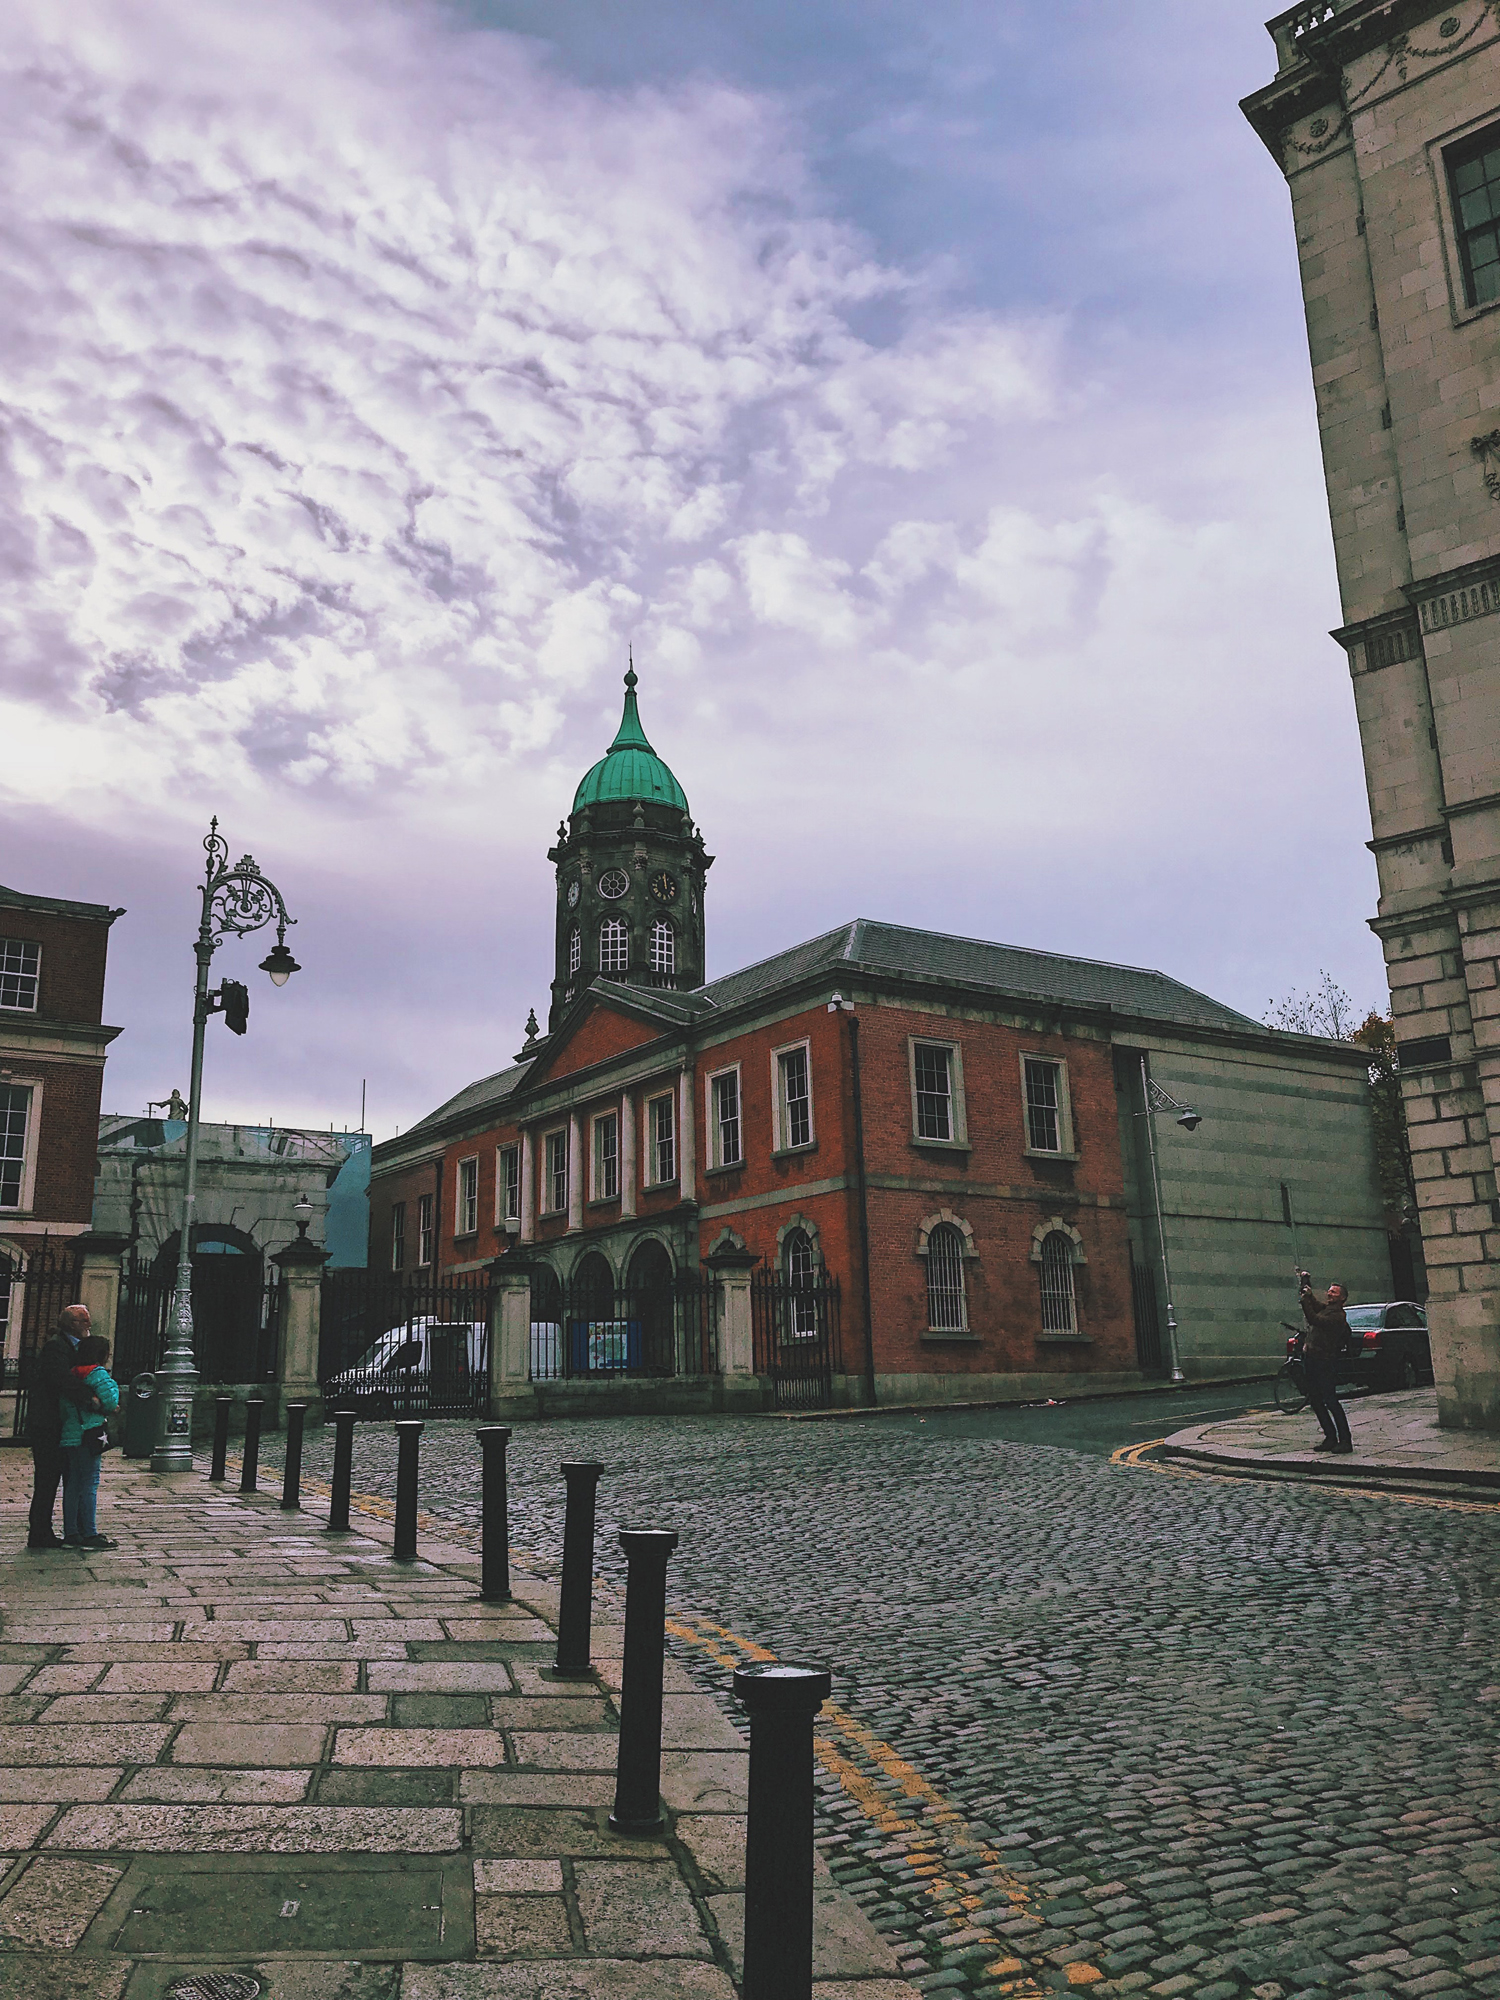 University College Cork building